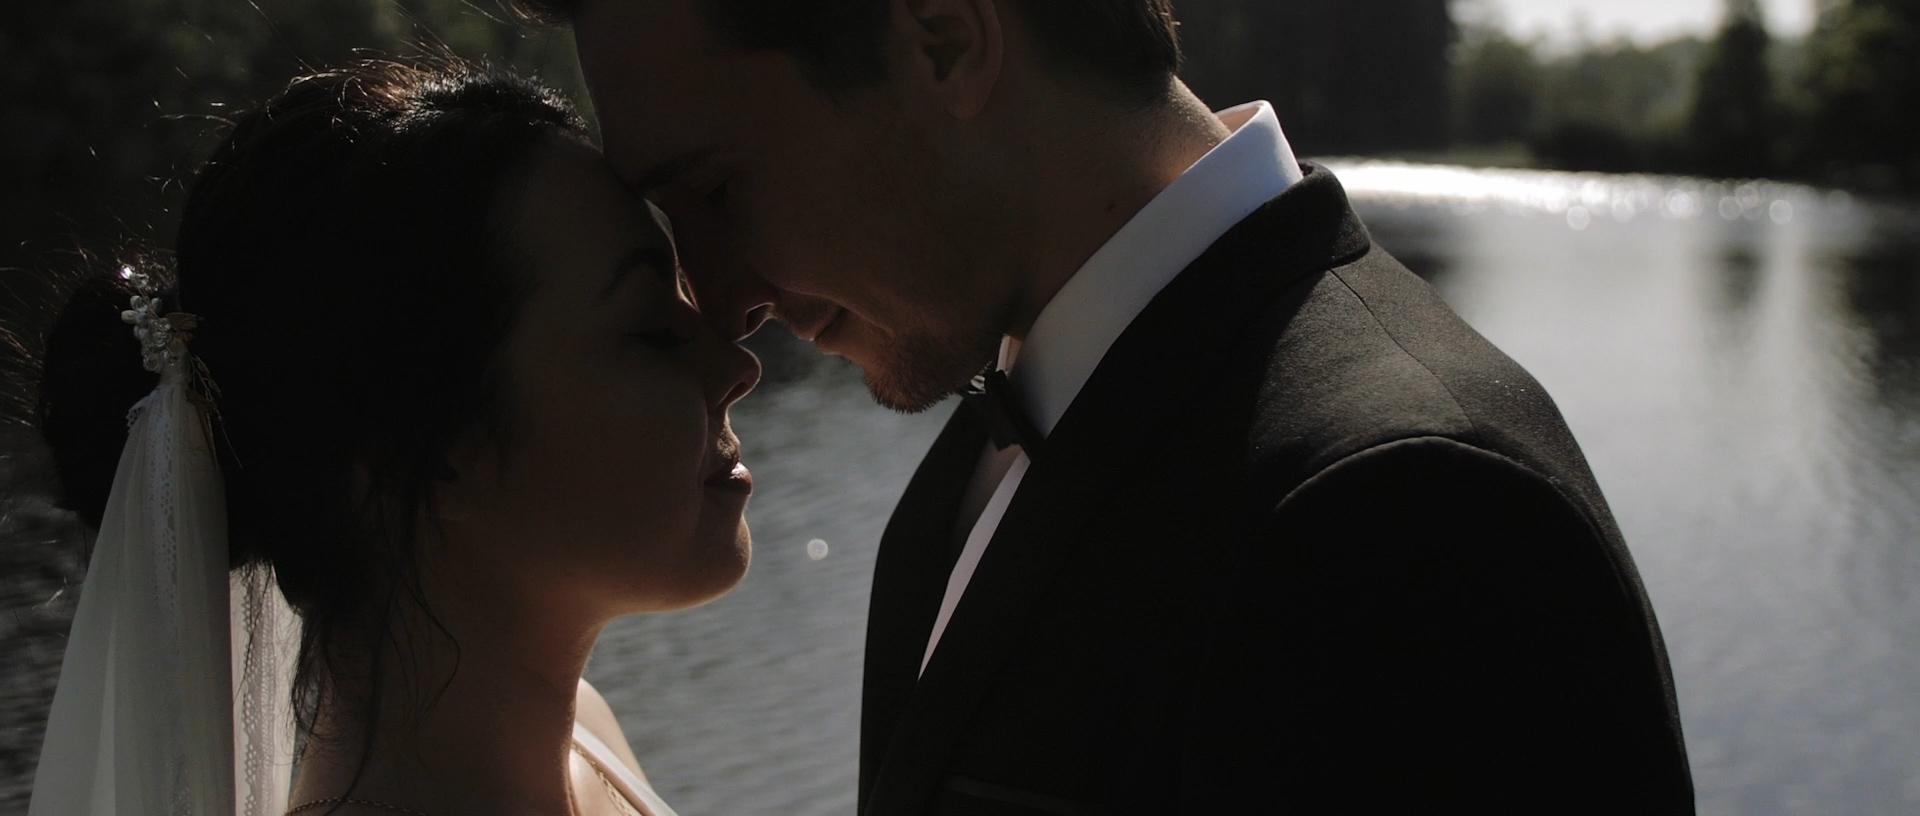 forgans-wedding-videographer_LL_07.jpg